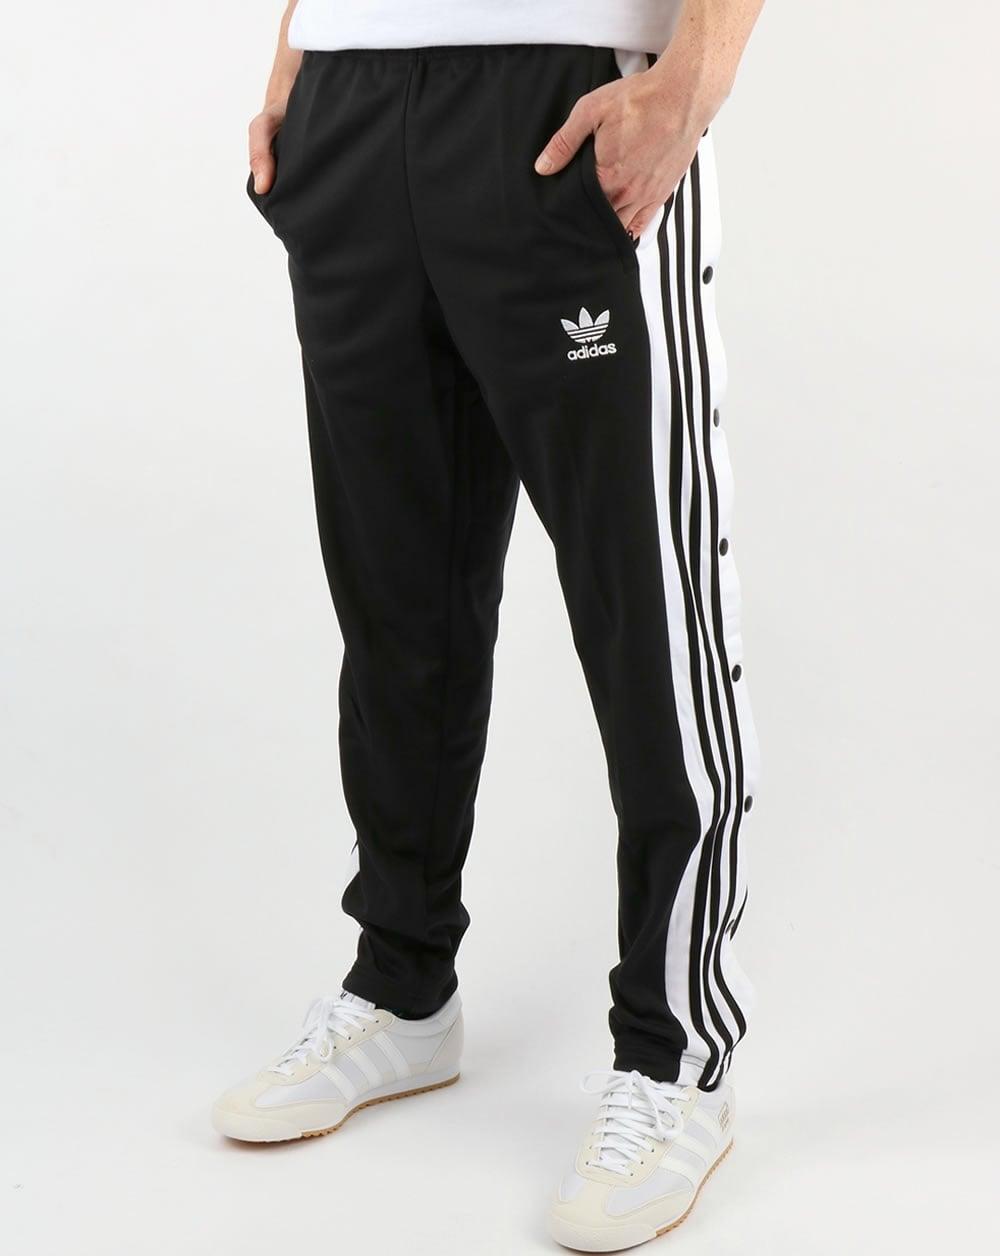 limited guantity attractive price exquisite style Adidas Originals Adibreak Track Pants Black